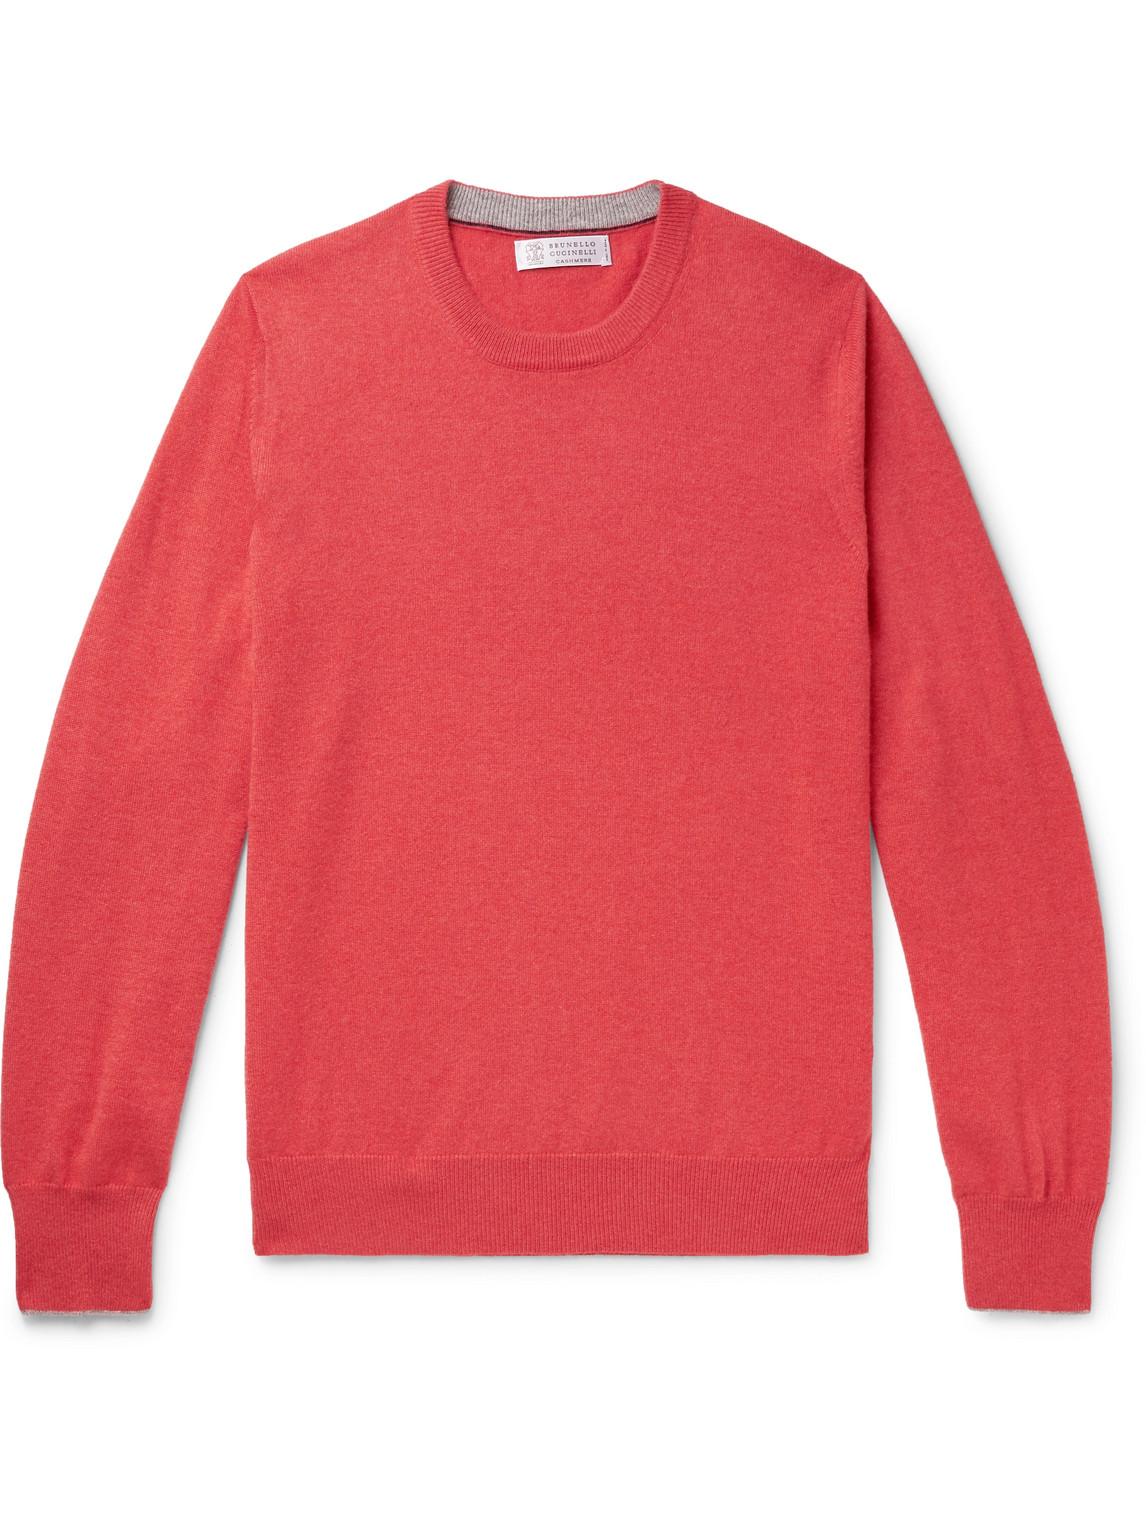 brunello cucinelli - slim-fit contrast-tipped cashmere sweater - men - red - it 46